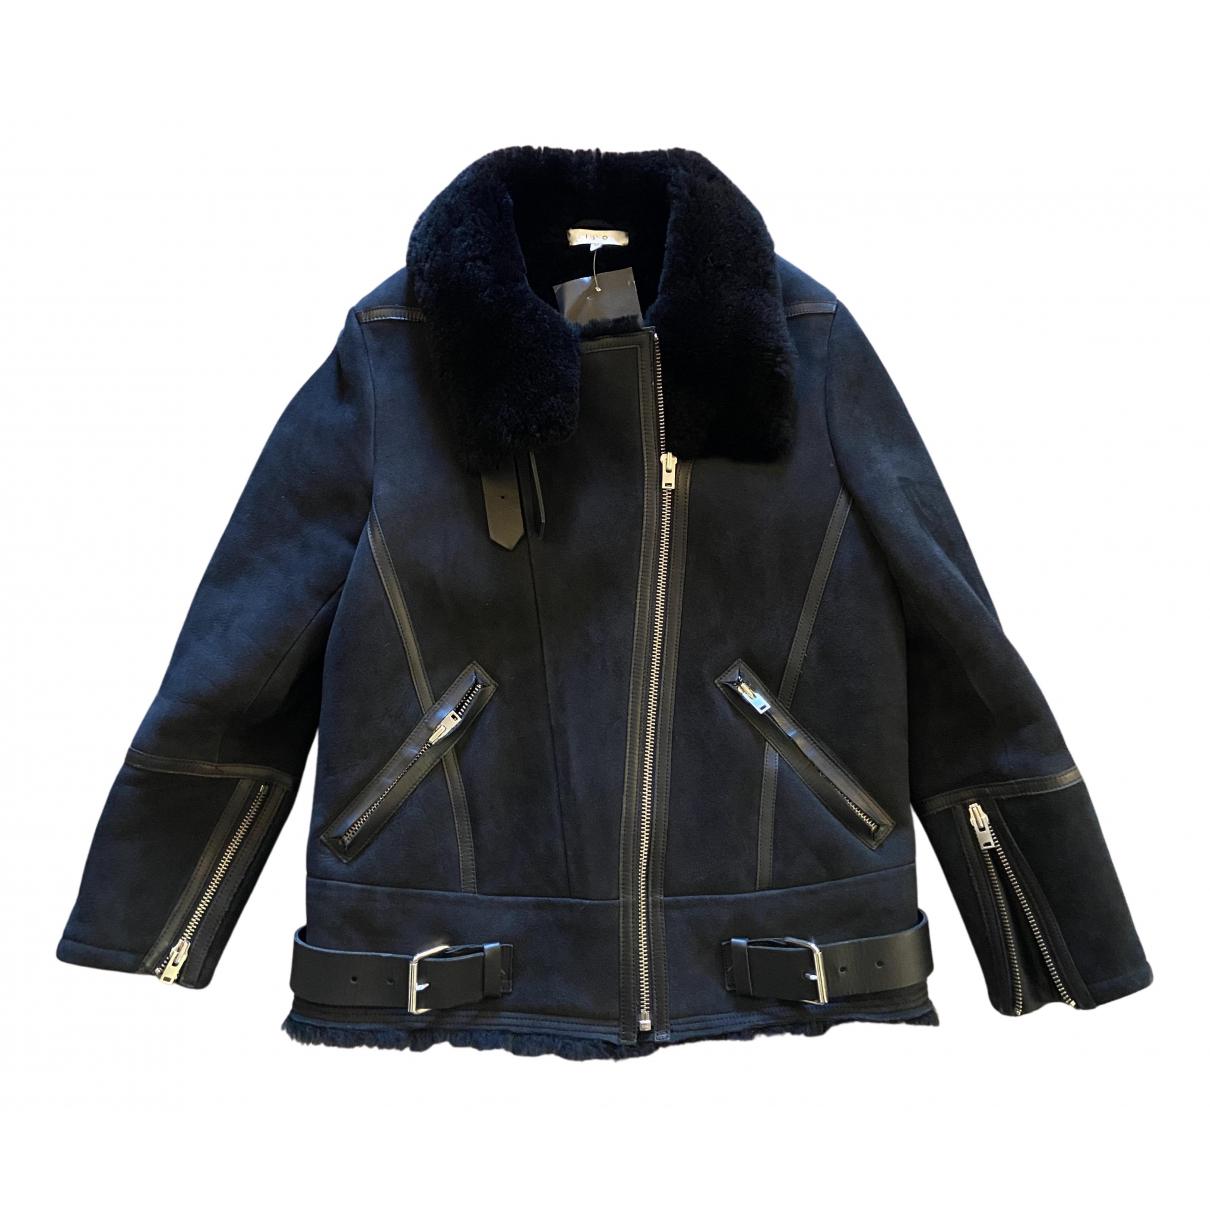 Iro - Blouson Fall Winter 2019 pour femme en cuir - noir